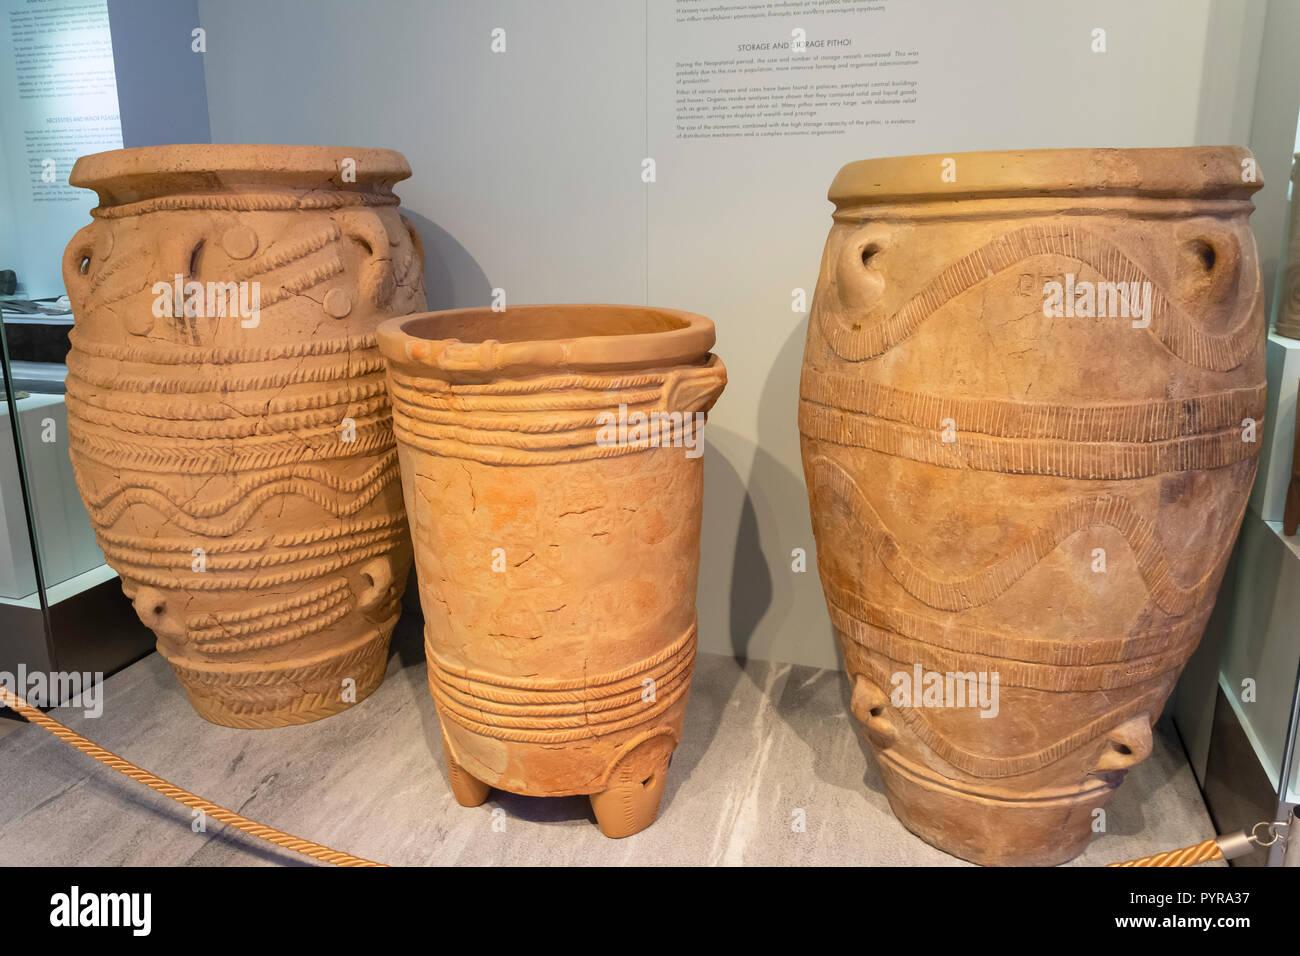 Greek Pithos storage vessels, Heraklion Archaeological Museum, Heraklion (Irakleio), Irakleio Region, Crete (Kriti), Greece - Stock Image